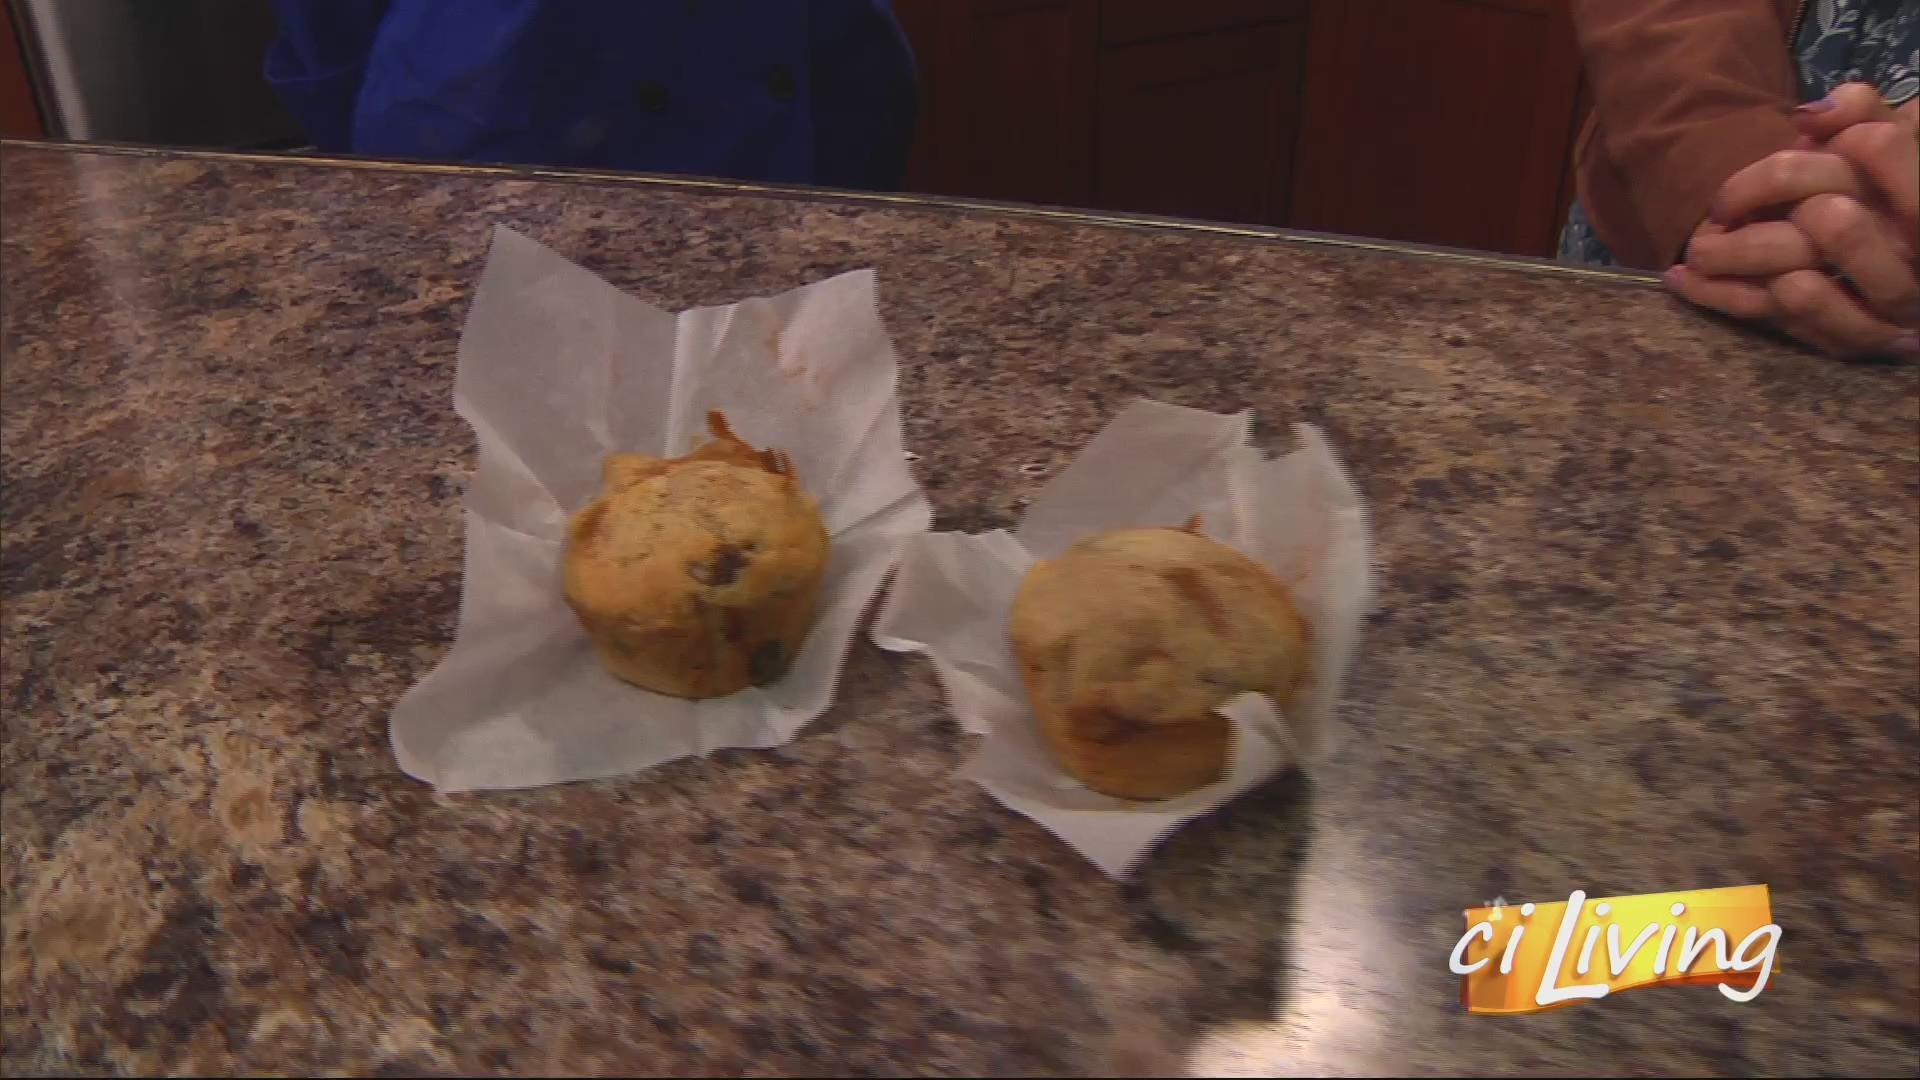 ciKitchen Muffin Recipe